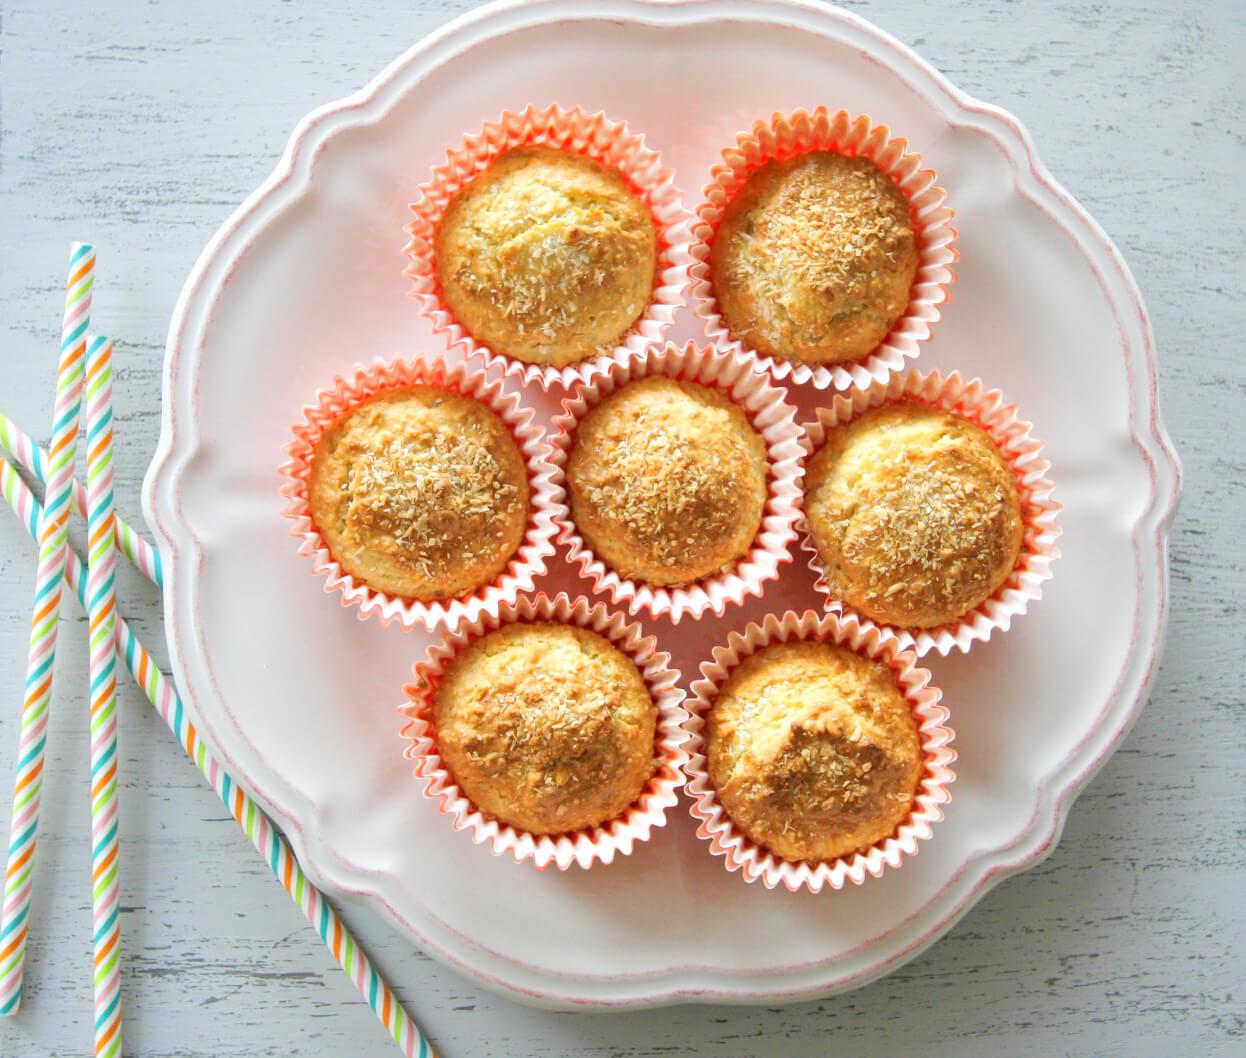 Almond flour coconut muffins